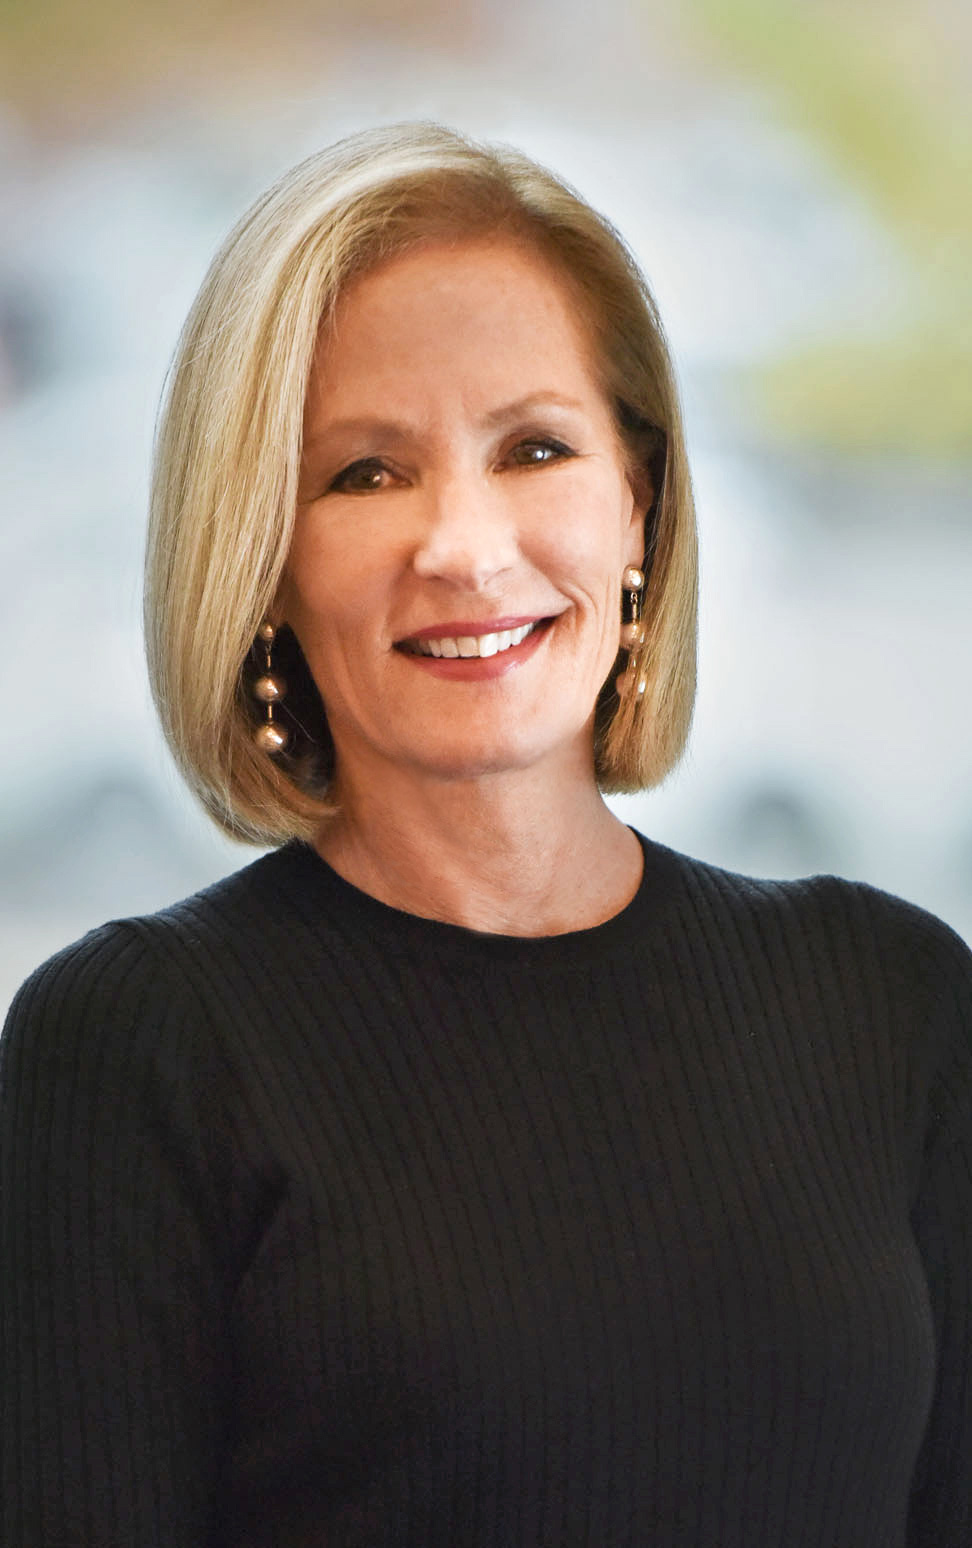 Diane Sullivan, Chairman & CEO, Caleres